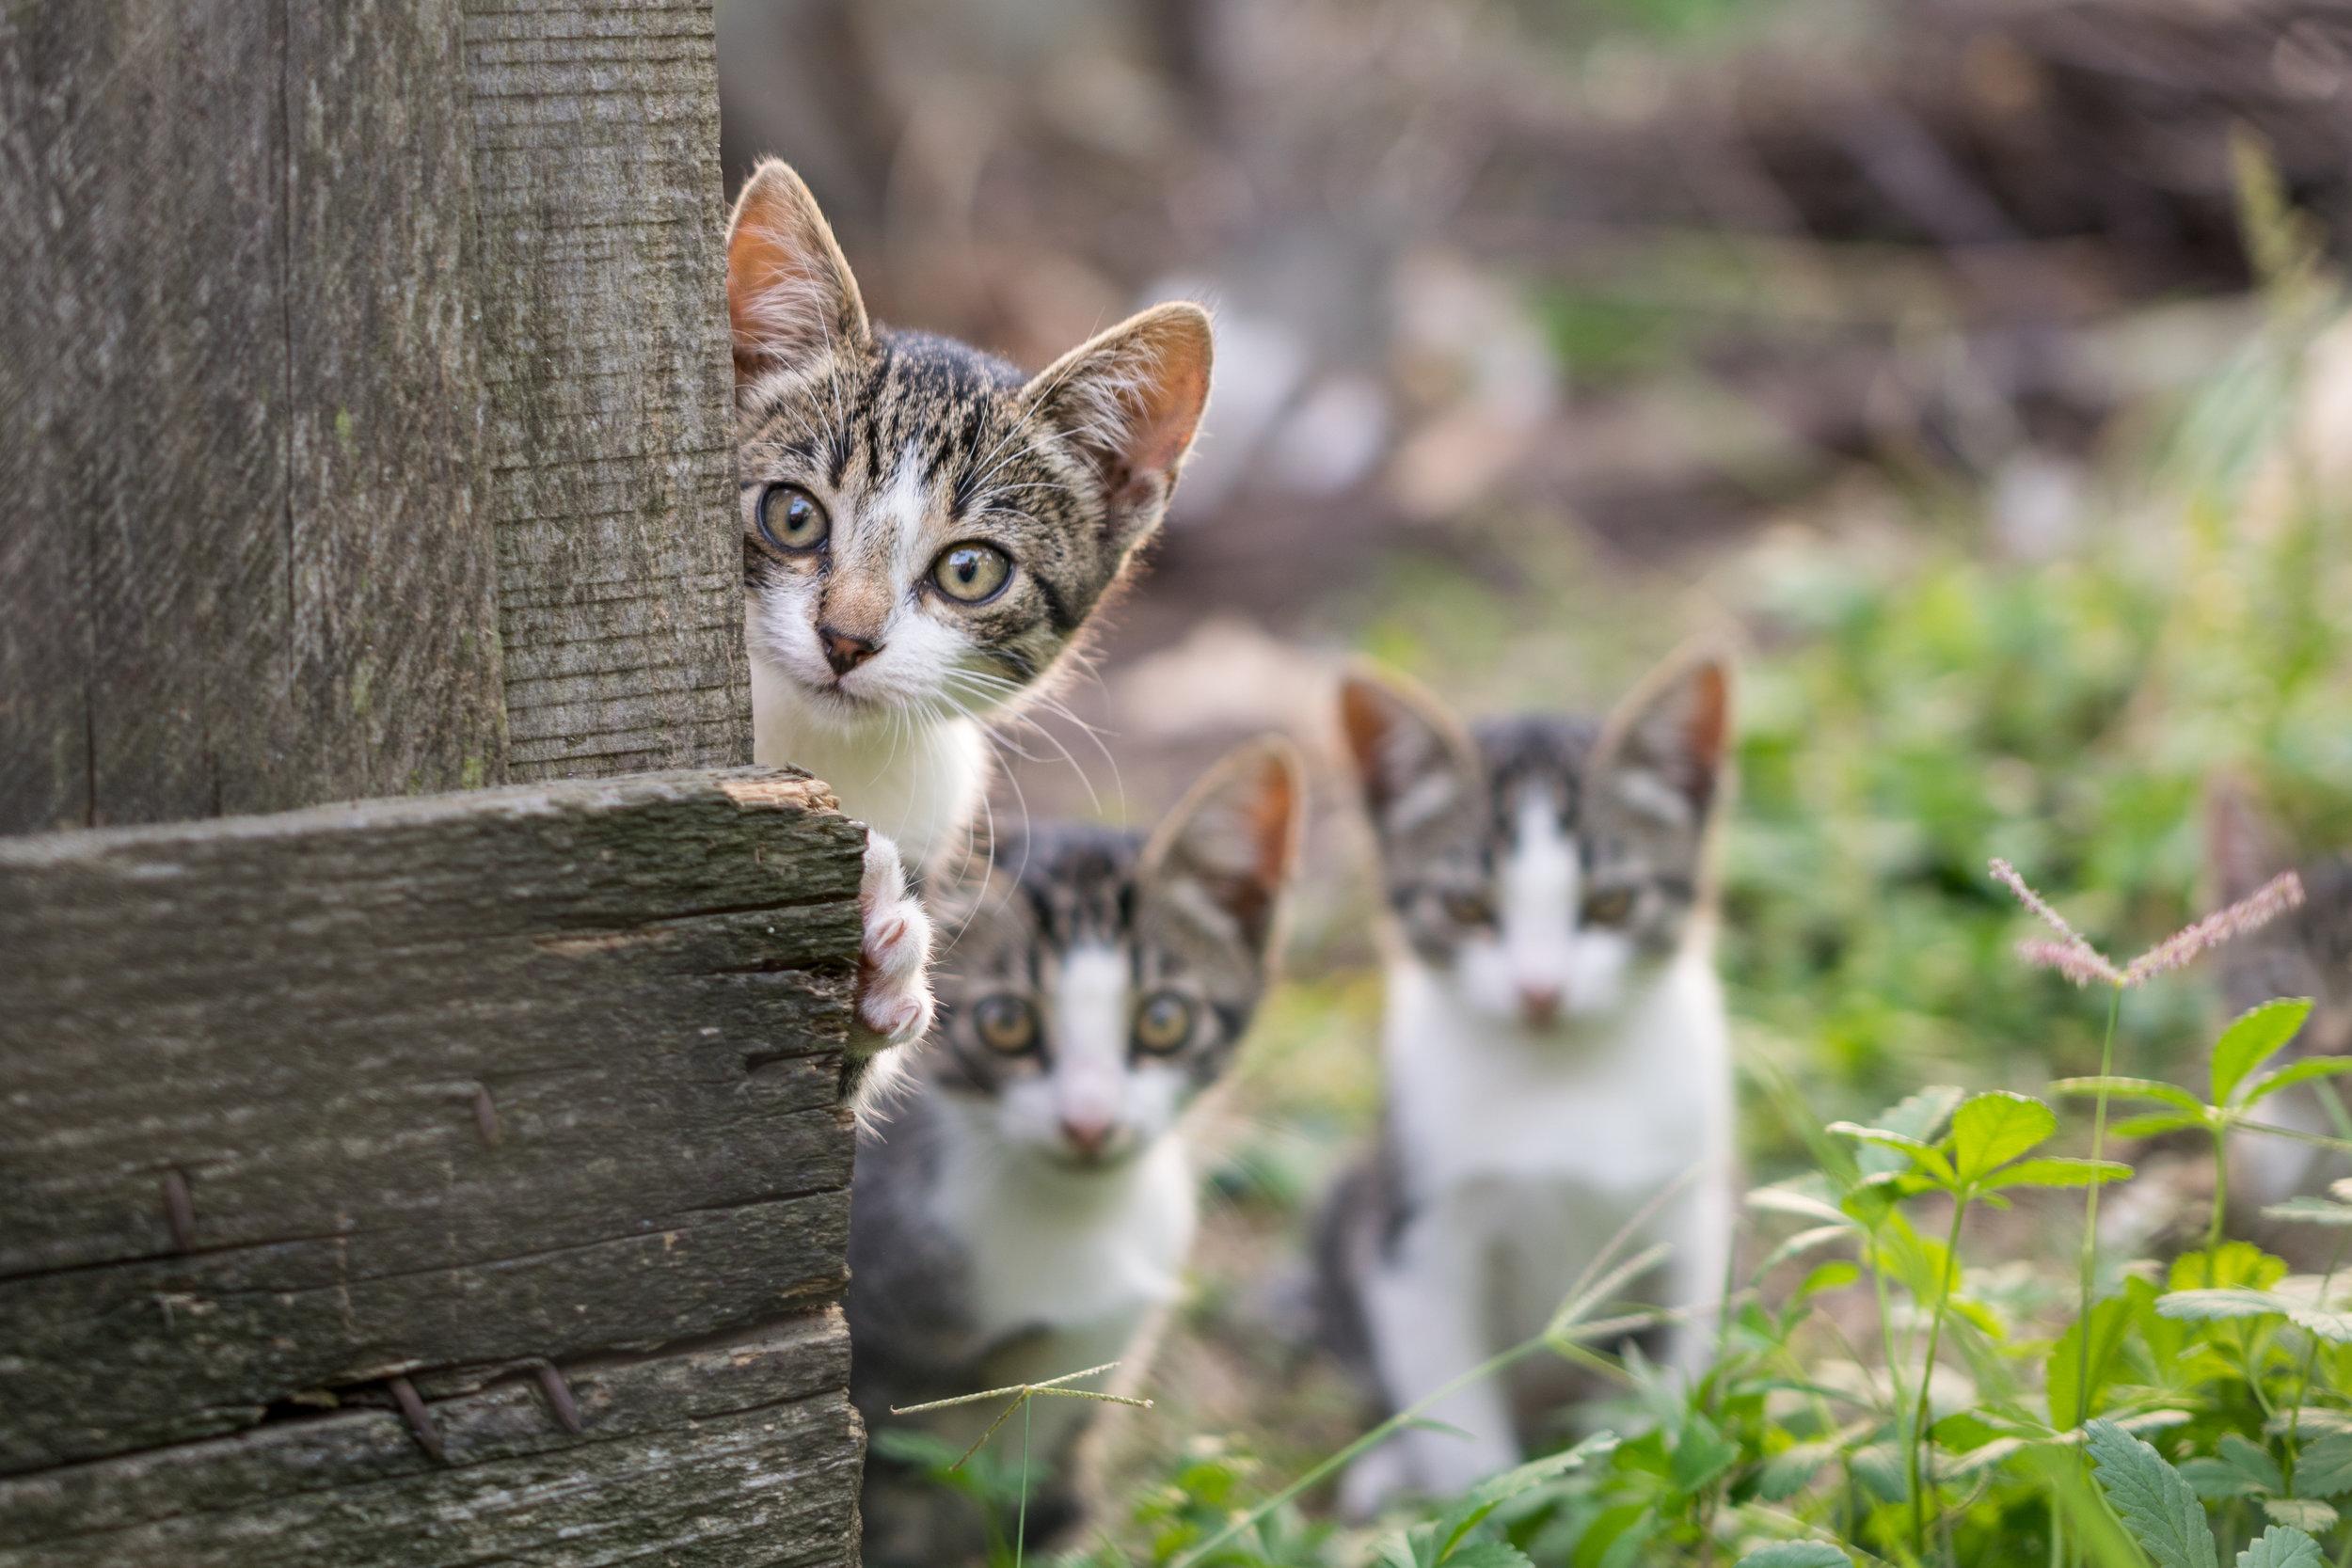 Curious-but-shy-kittens-491746652_4681x3121.jpeg